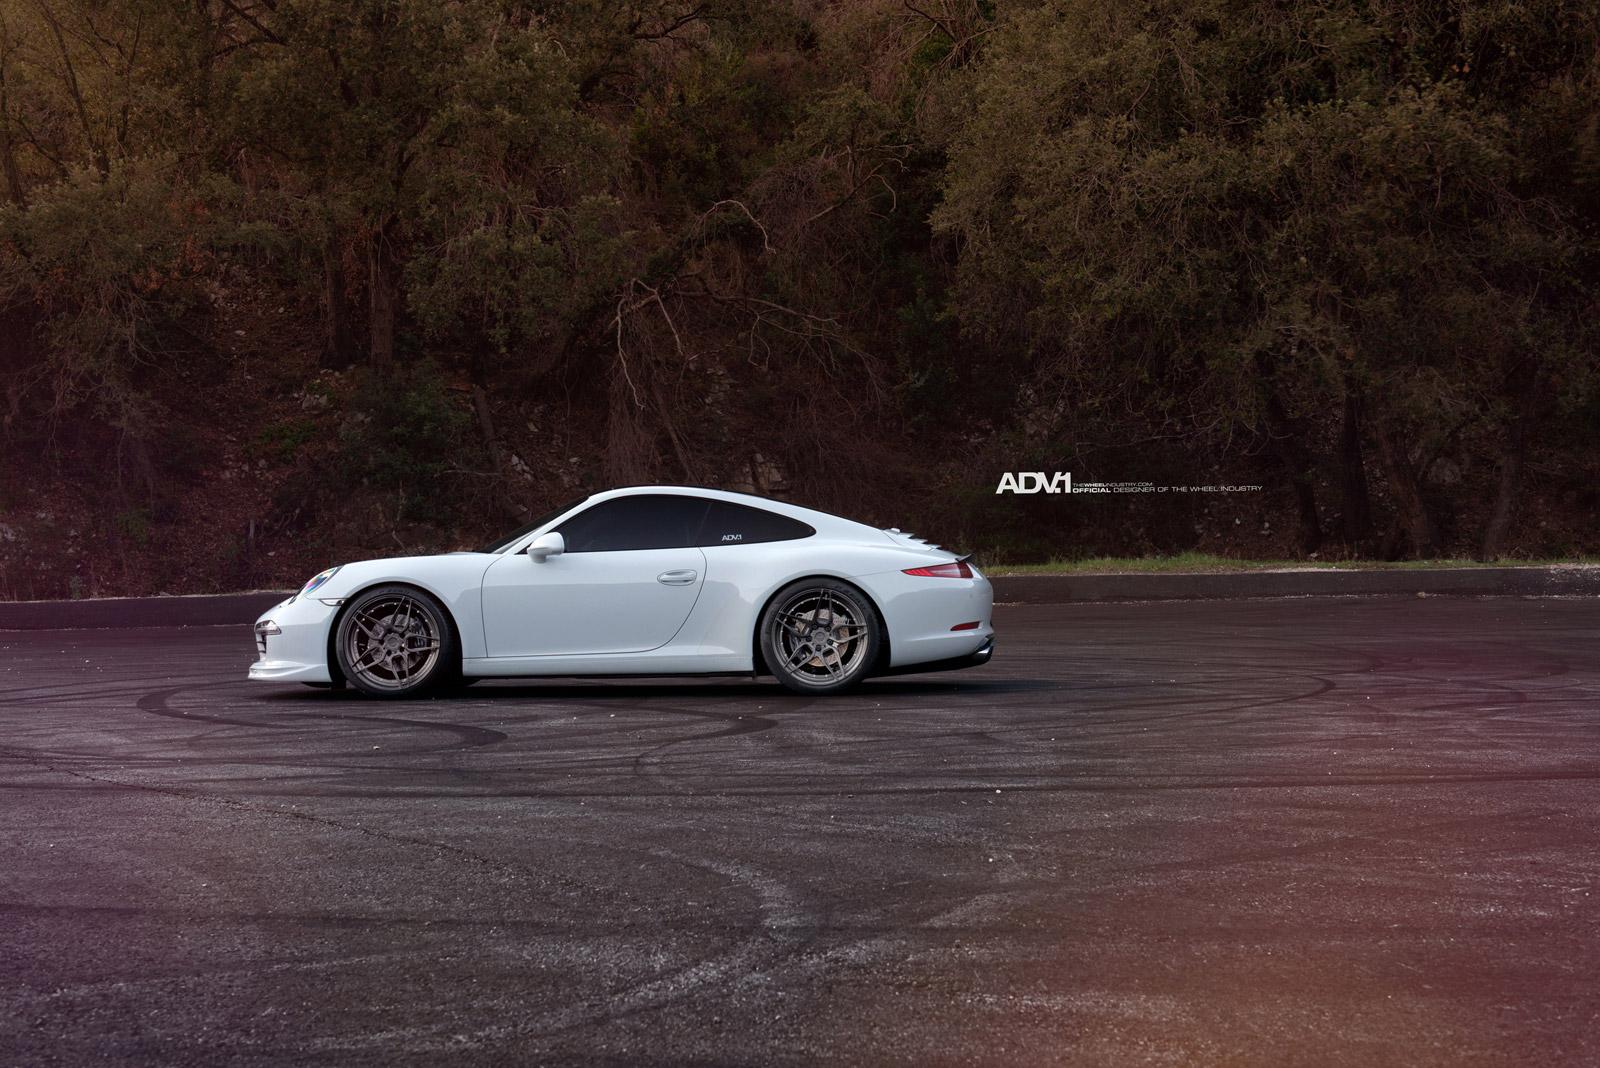 ADV1-Wheels-Porsche-991-Carrera-ADV05SMV2CS-11